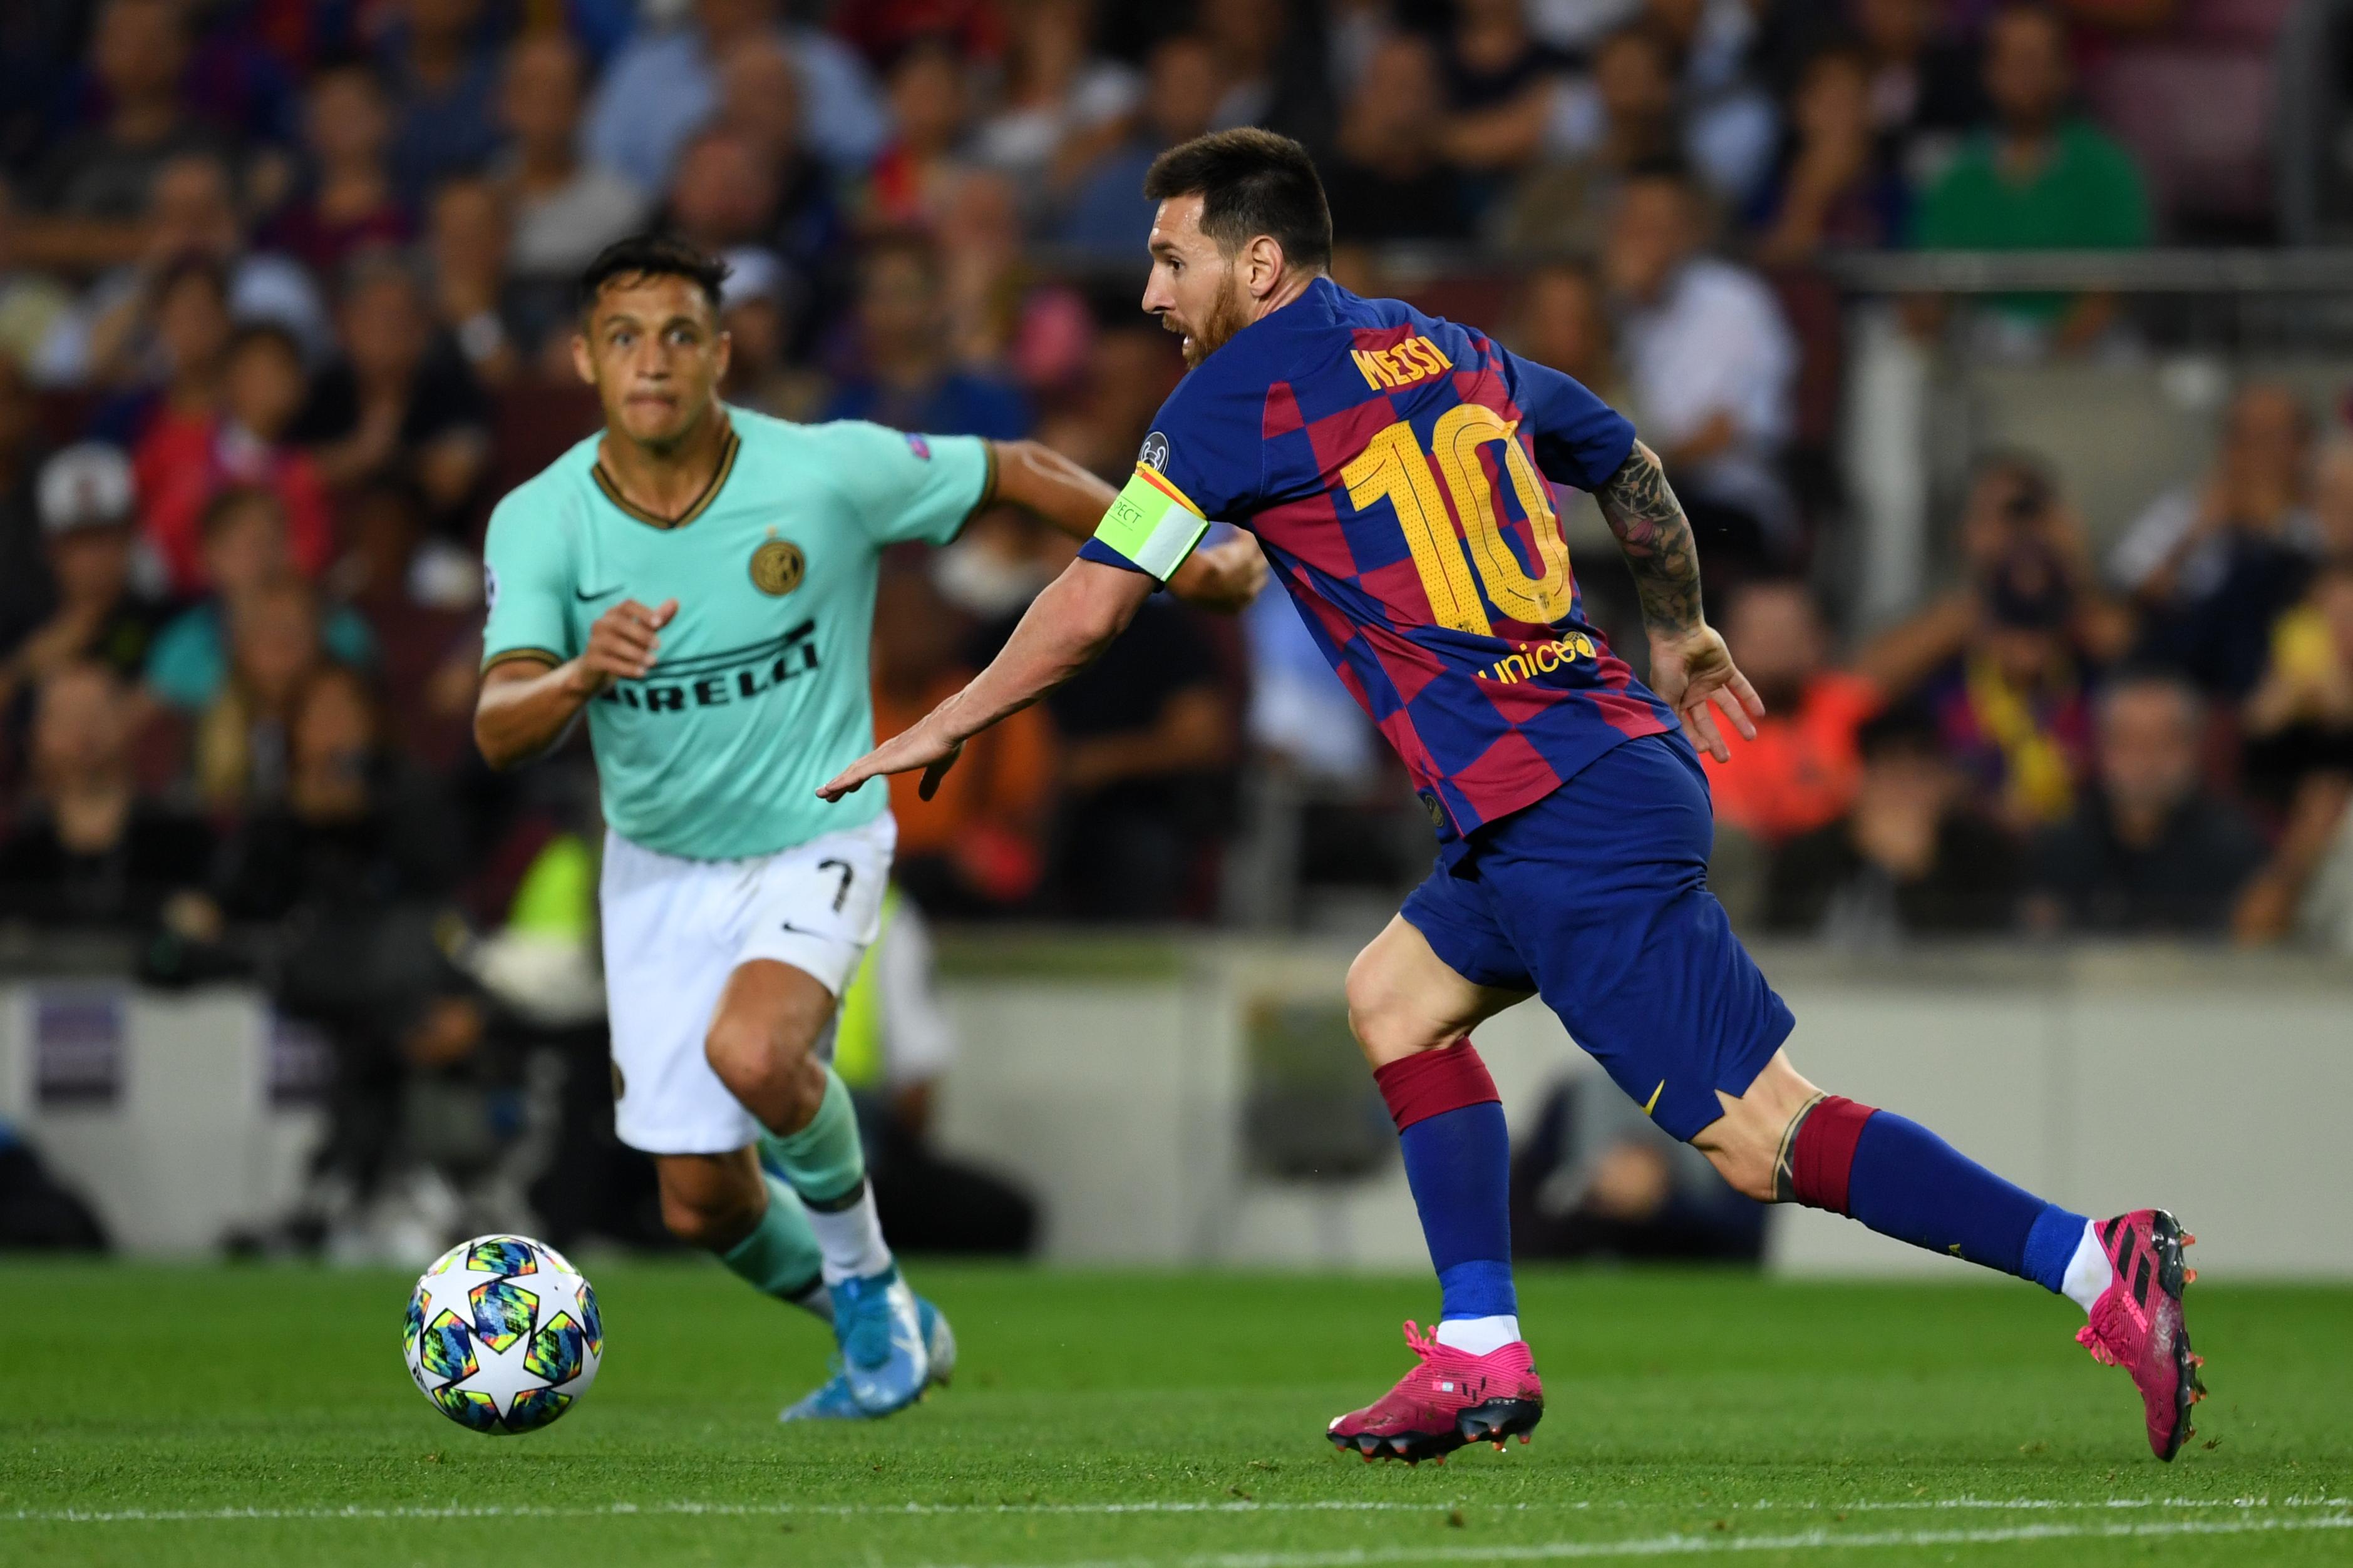 FC Barcelona v Inter: Group F - UEFA Champions League